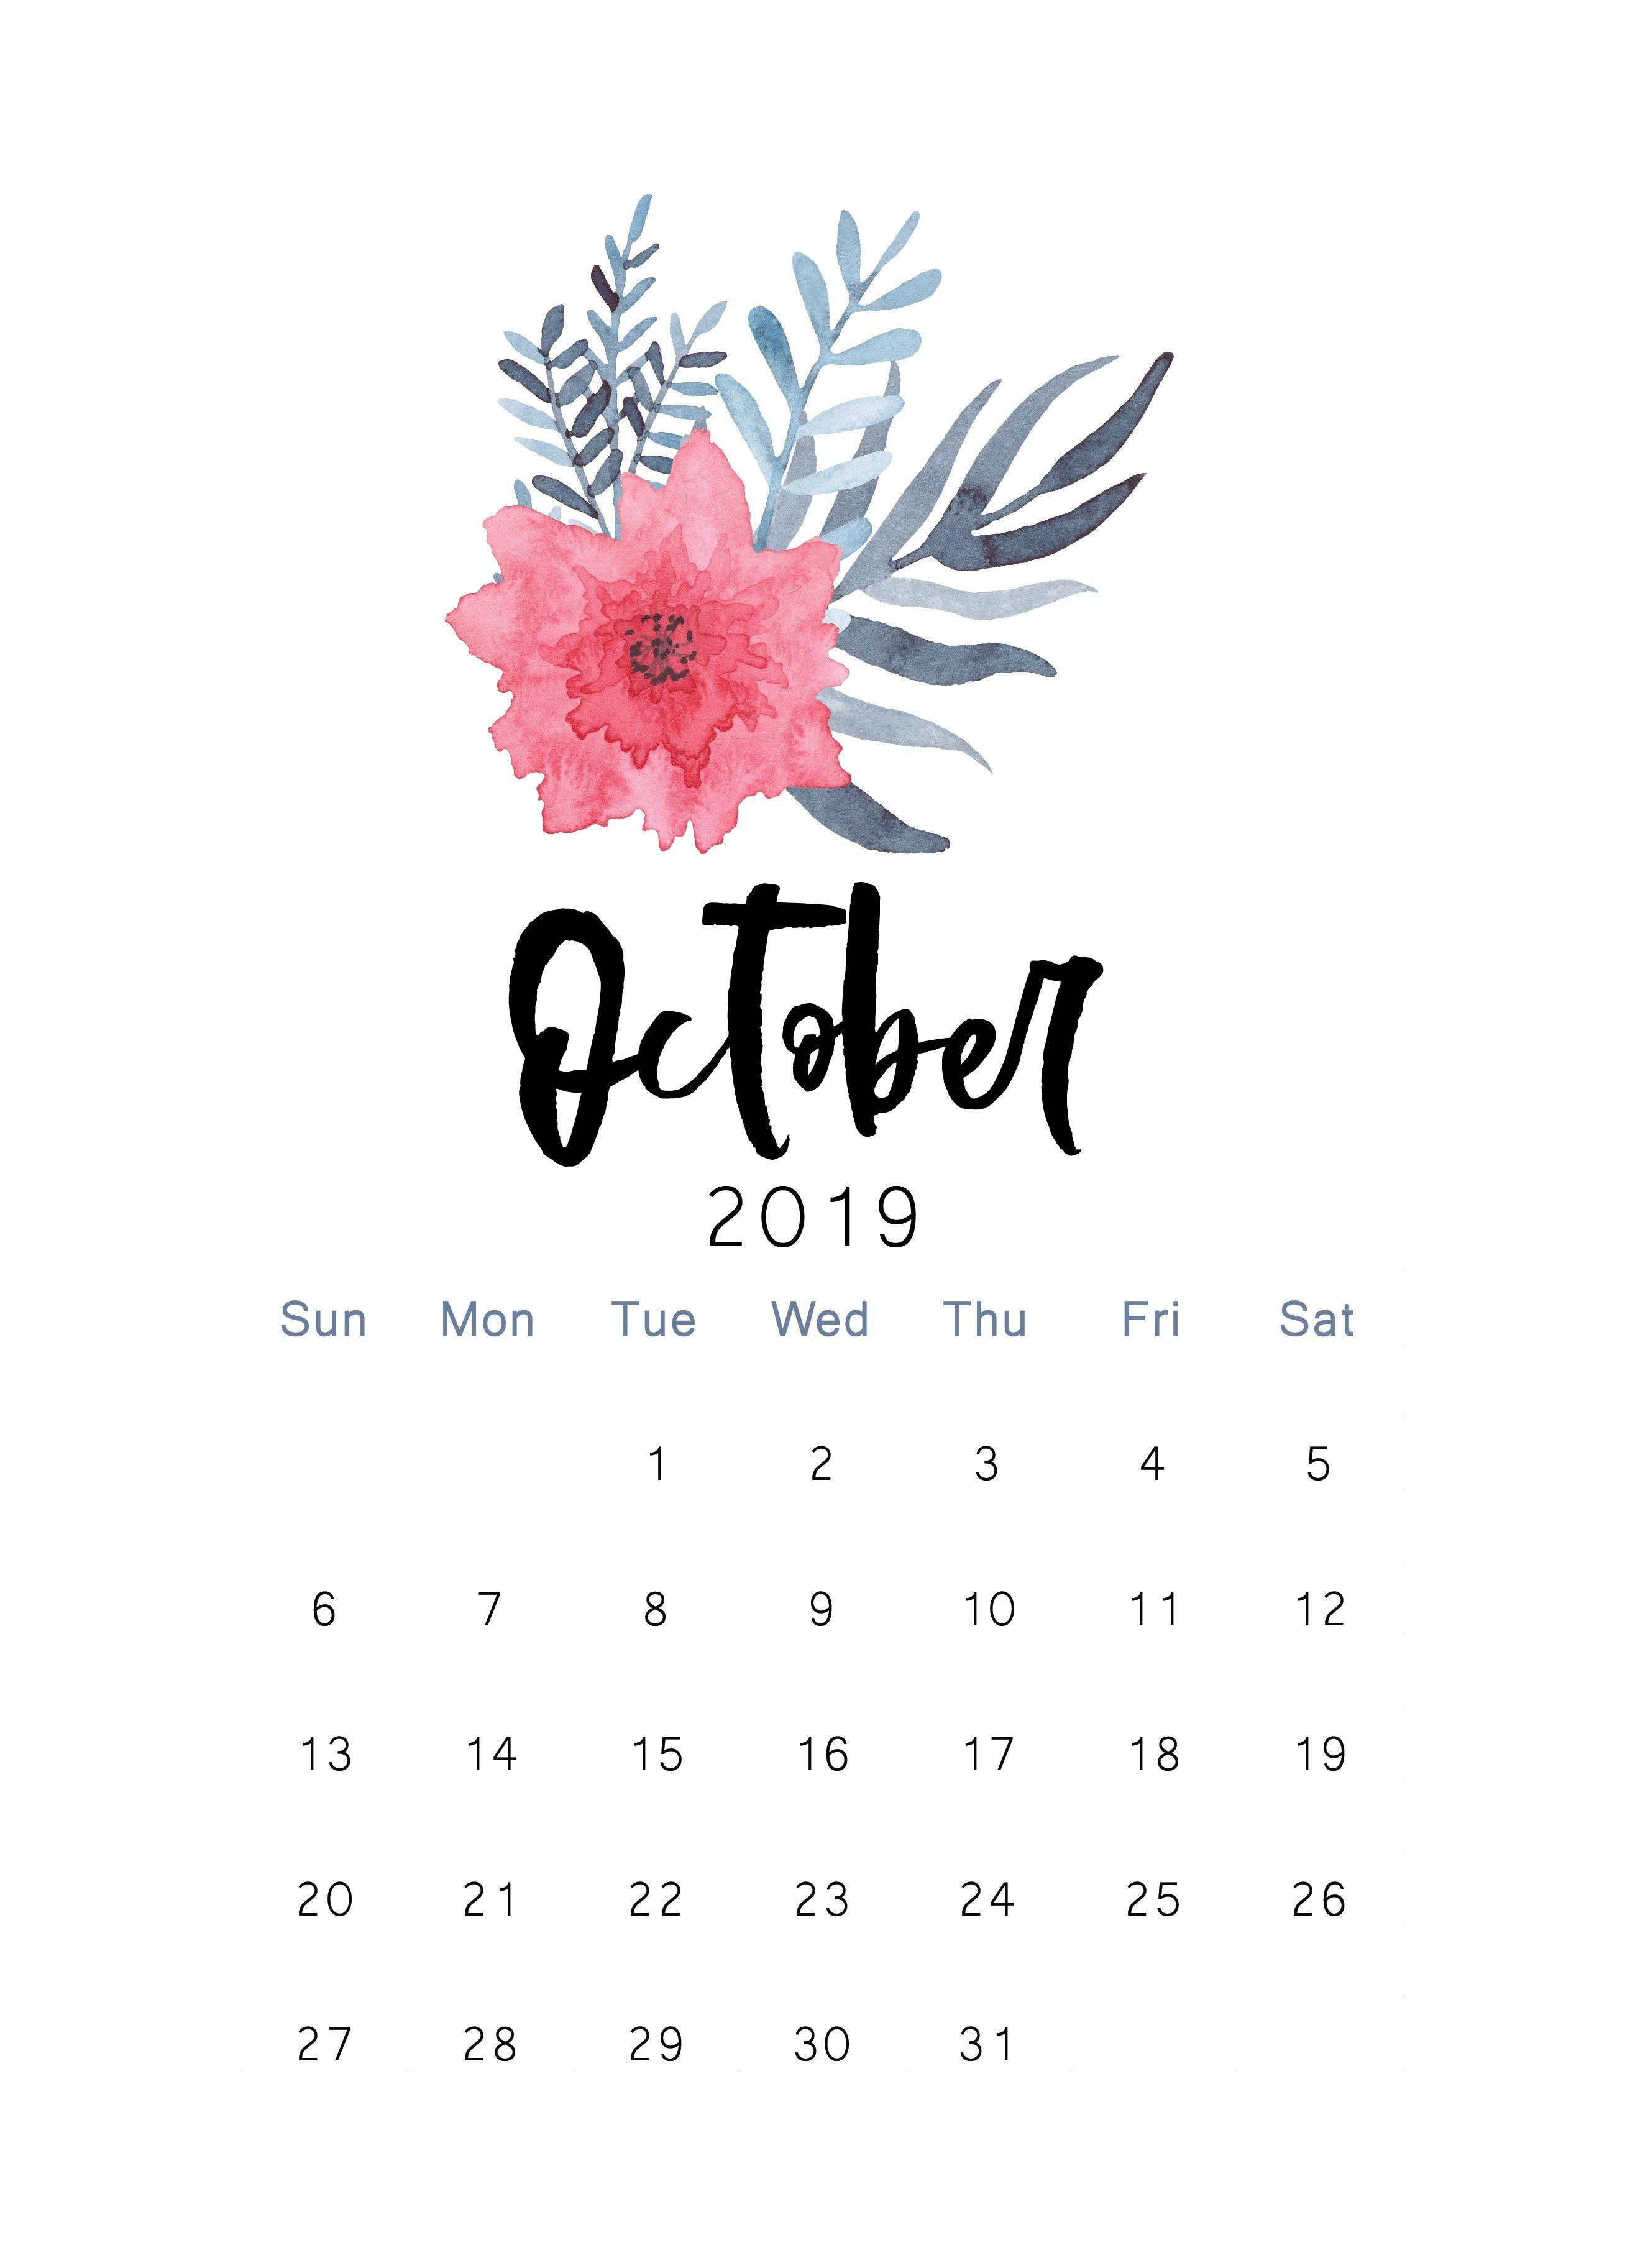 Calendario 2019 Para Imprimir Gratis Bonitos Más Caliente October 2019 Printable Calendar Printable